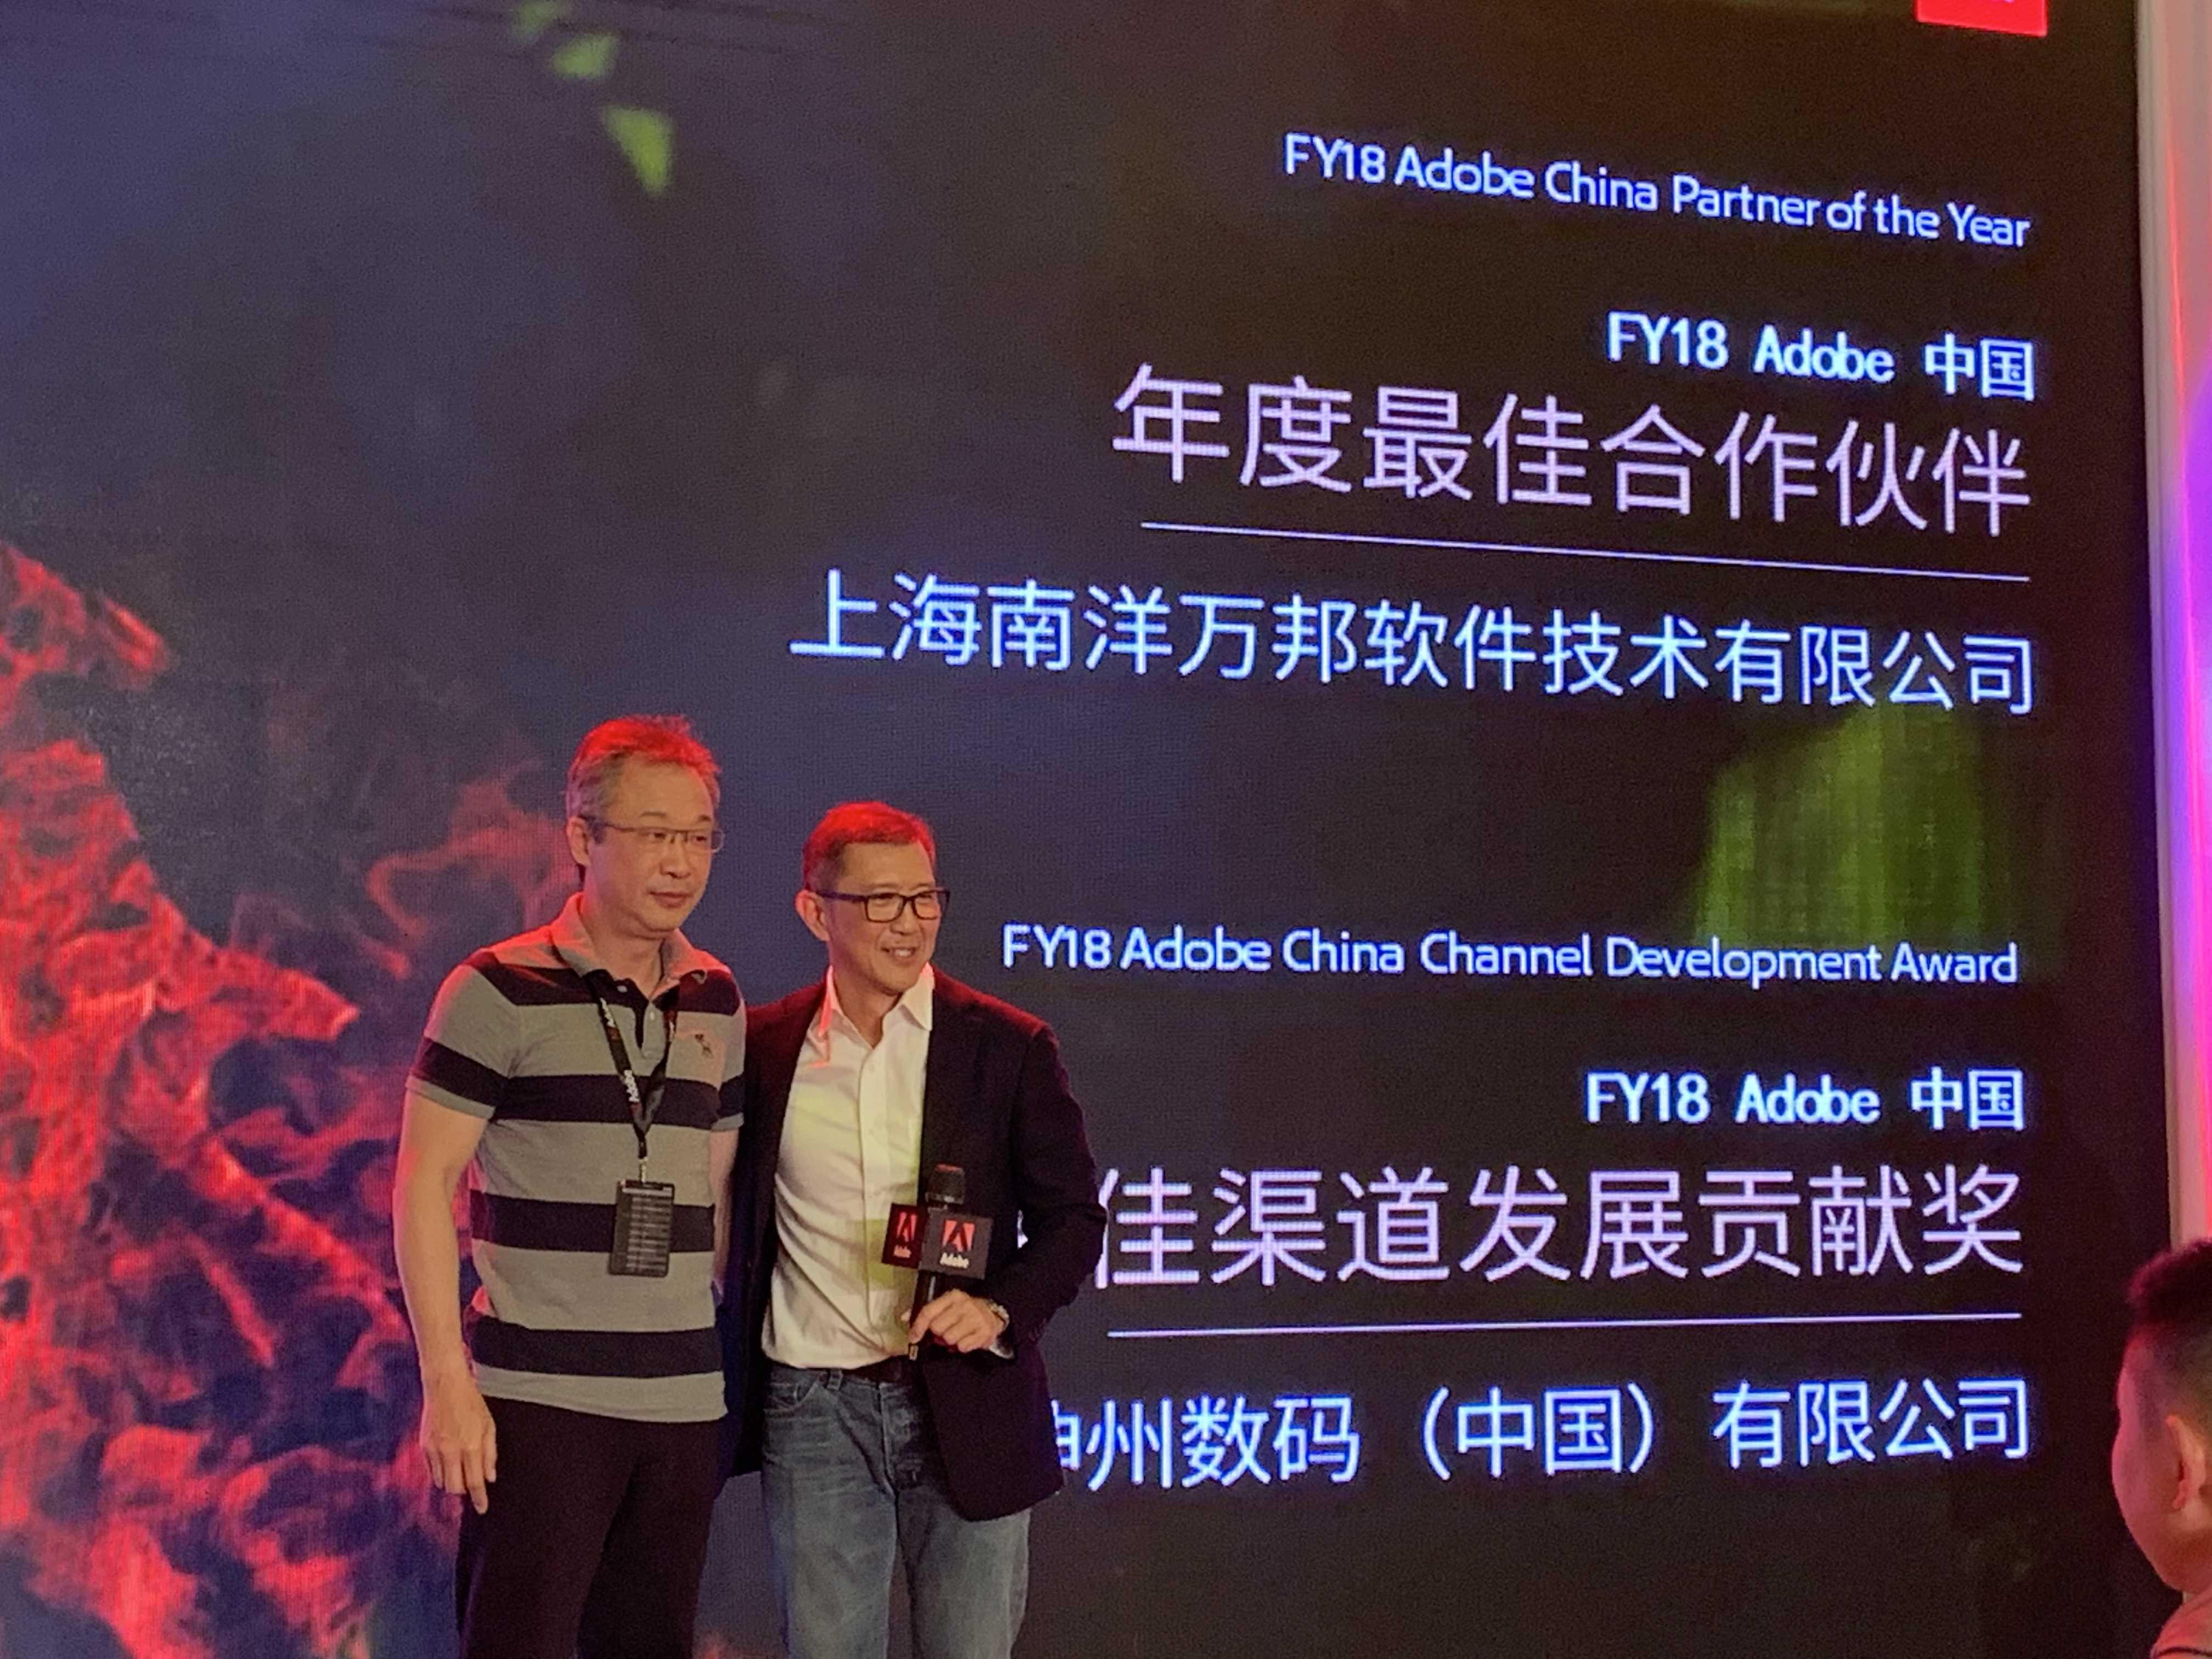 FY18Adobe中国区年度最佳合作伙伴